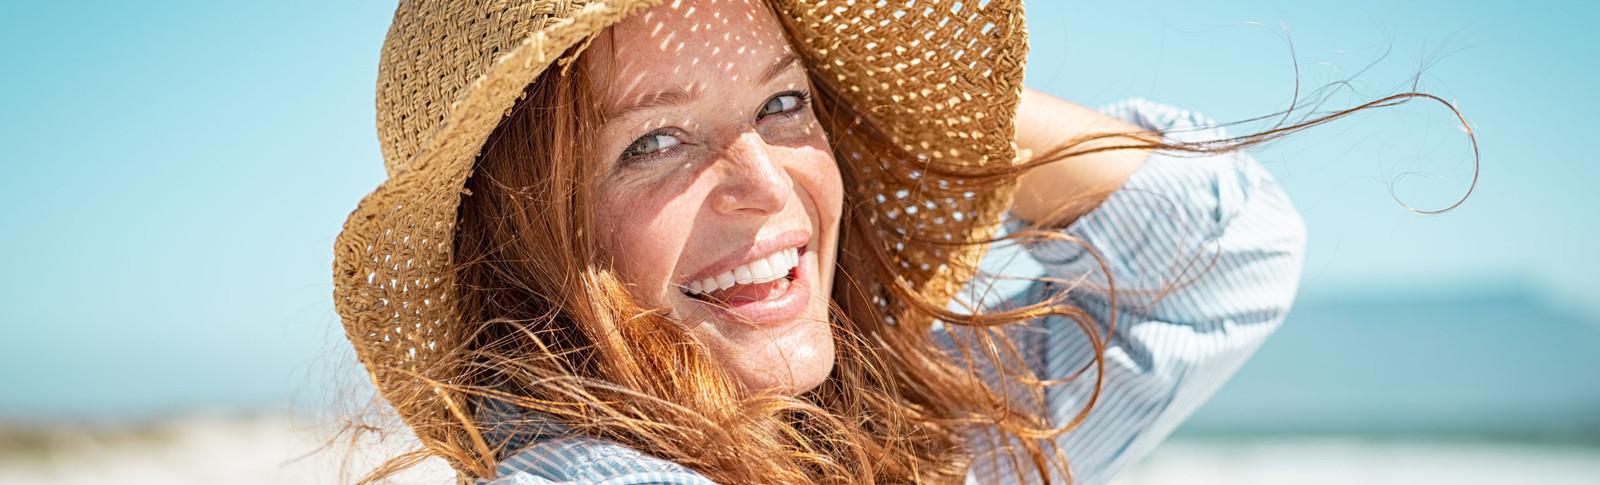 Frau macht Selfie nach Nasenkorrektur